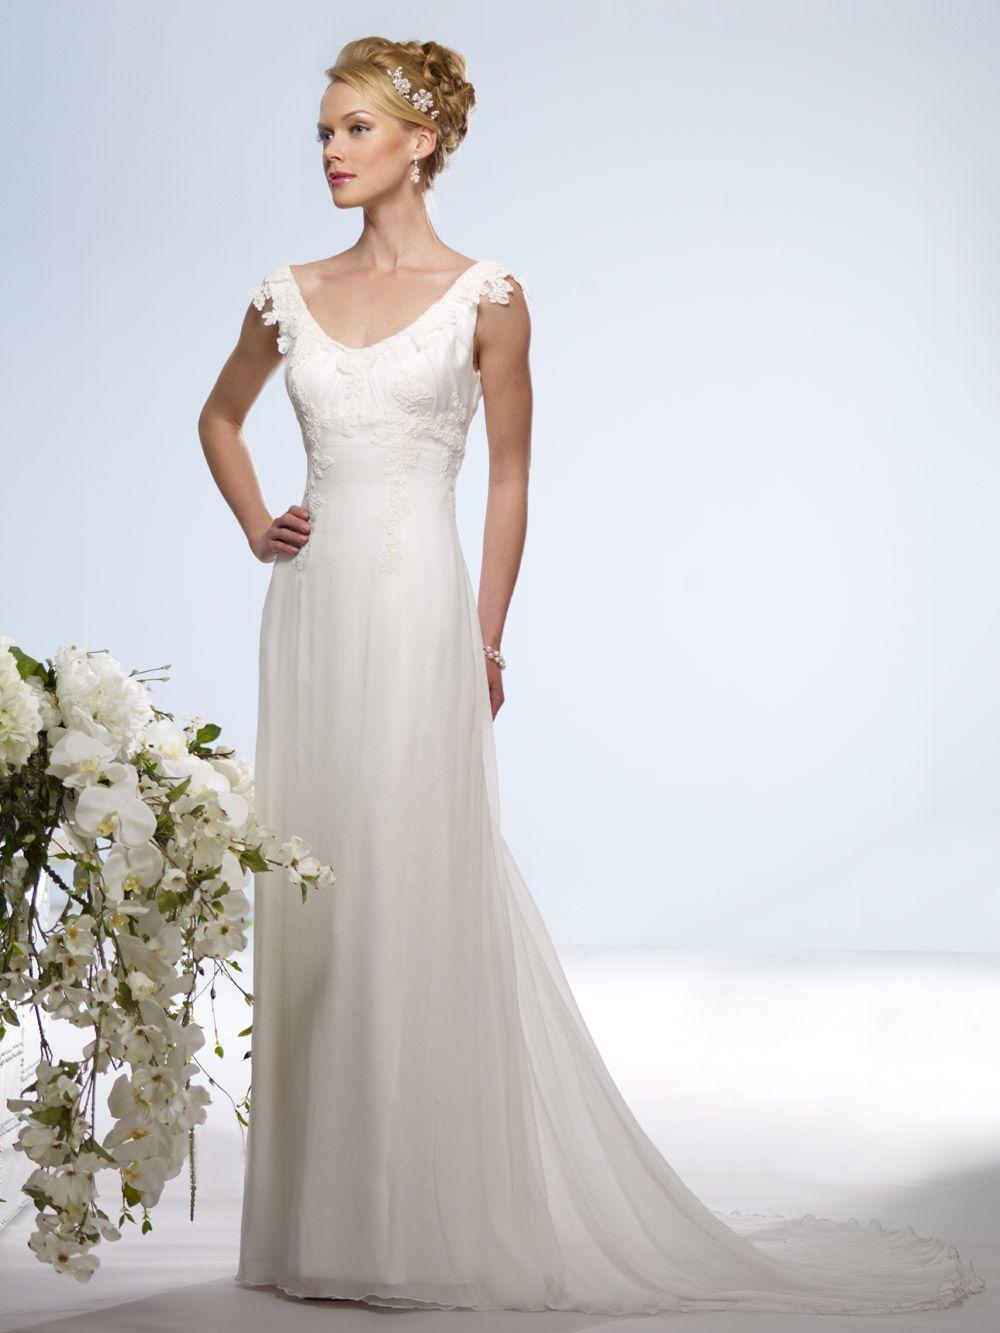 Robert bullock lillie at miss ruby boutique wedding dresses